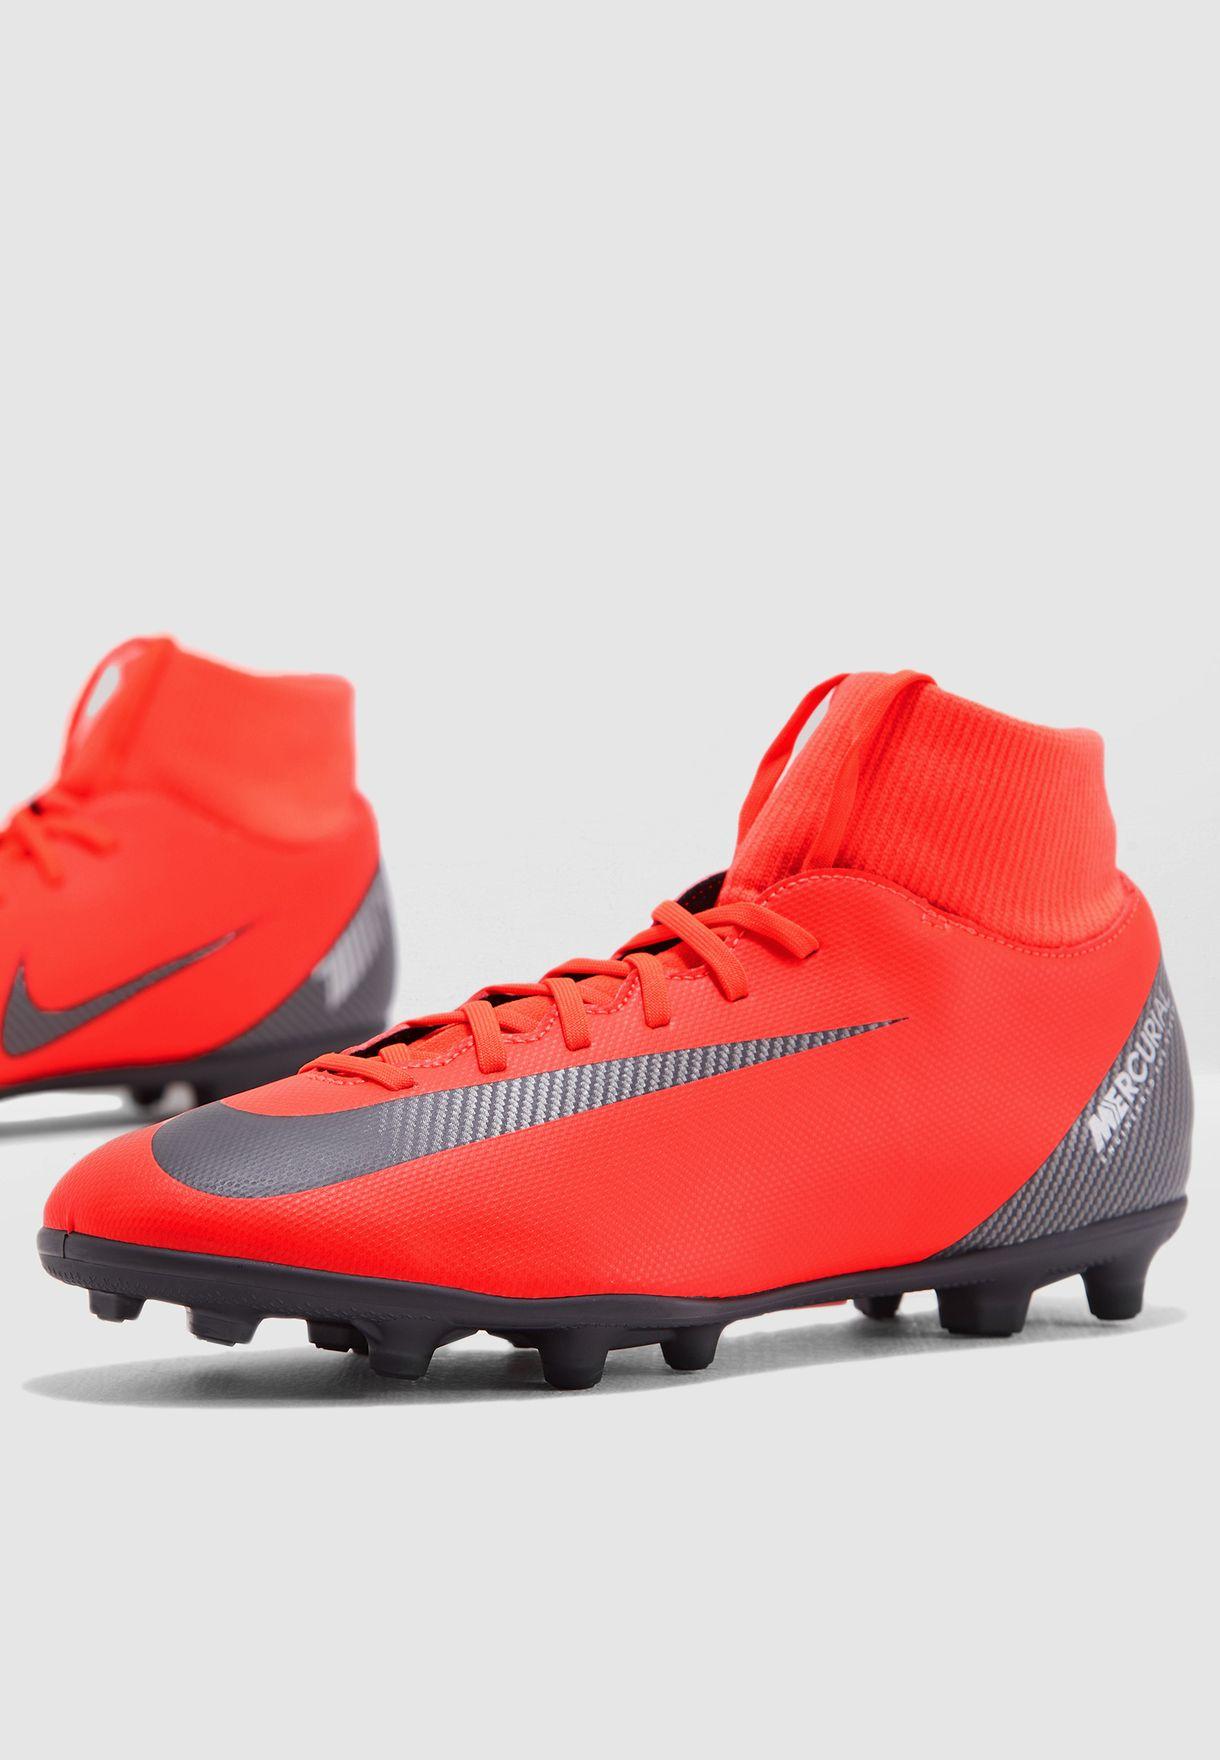 1a397e32a Shop Nike red Mercurial Superfly 6 Club CR7 FG AJ3545-600 for Men in ...